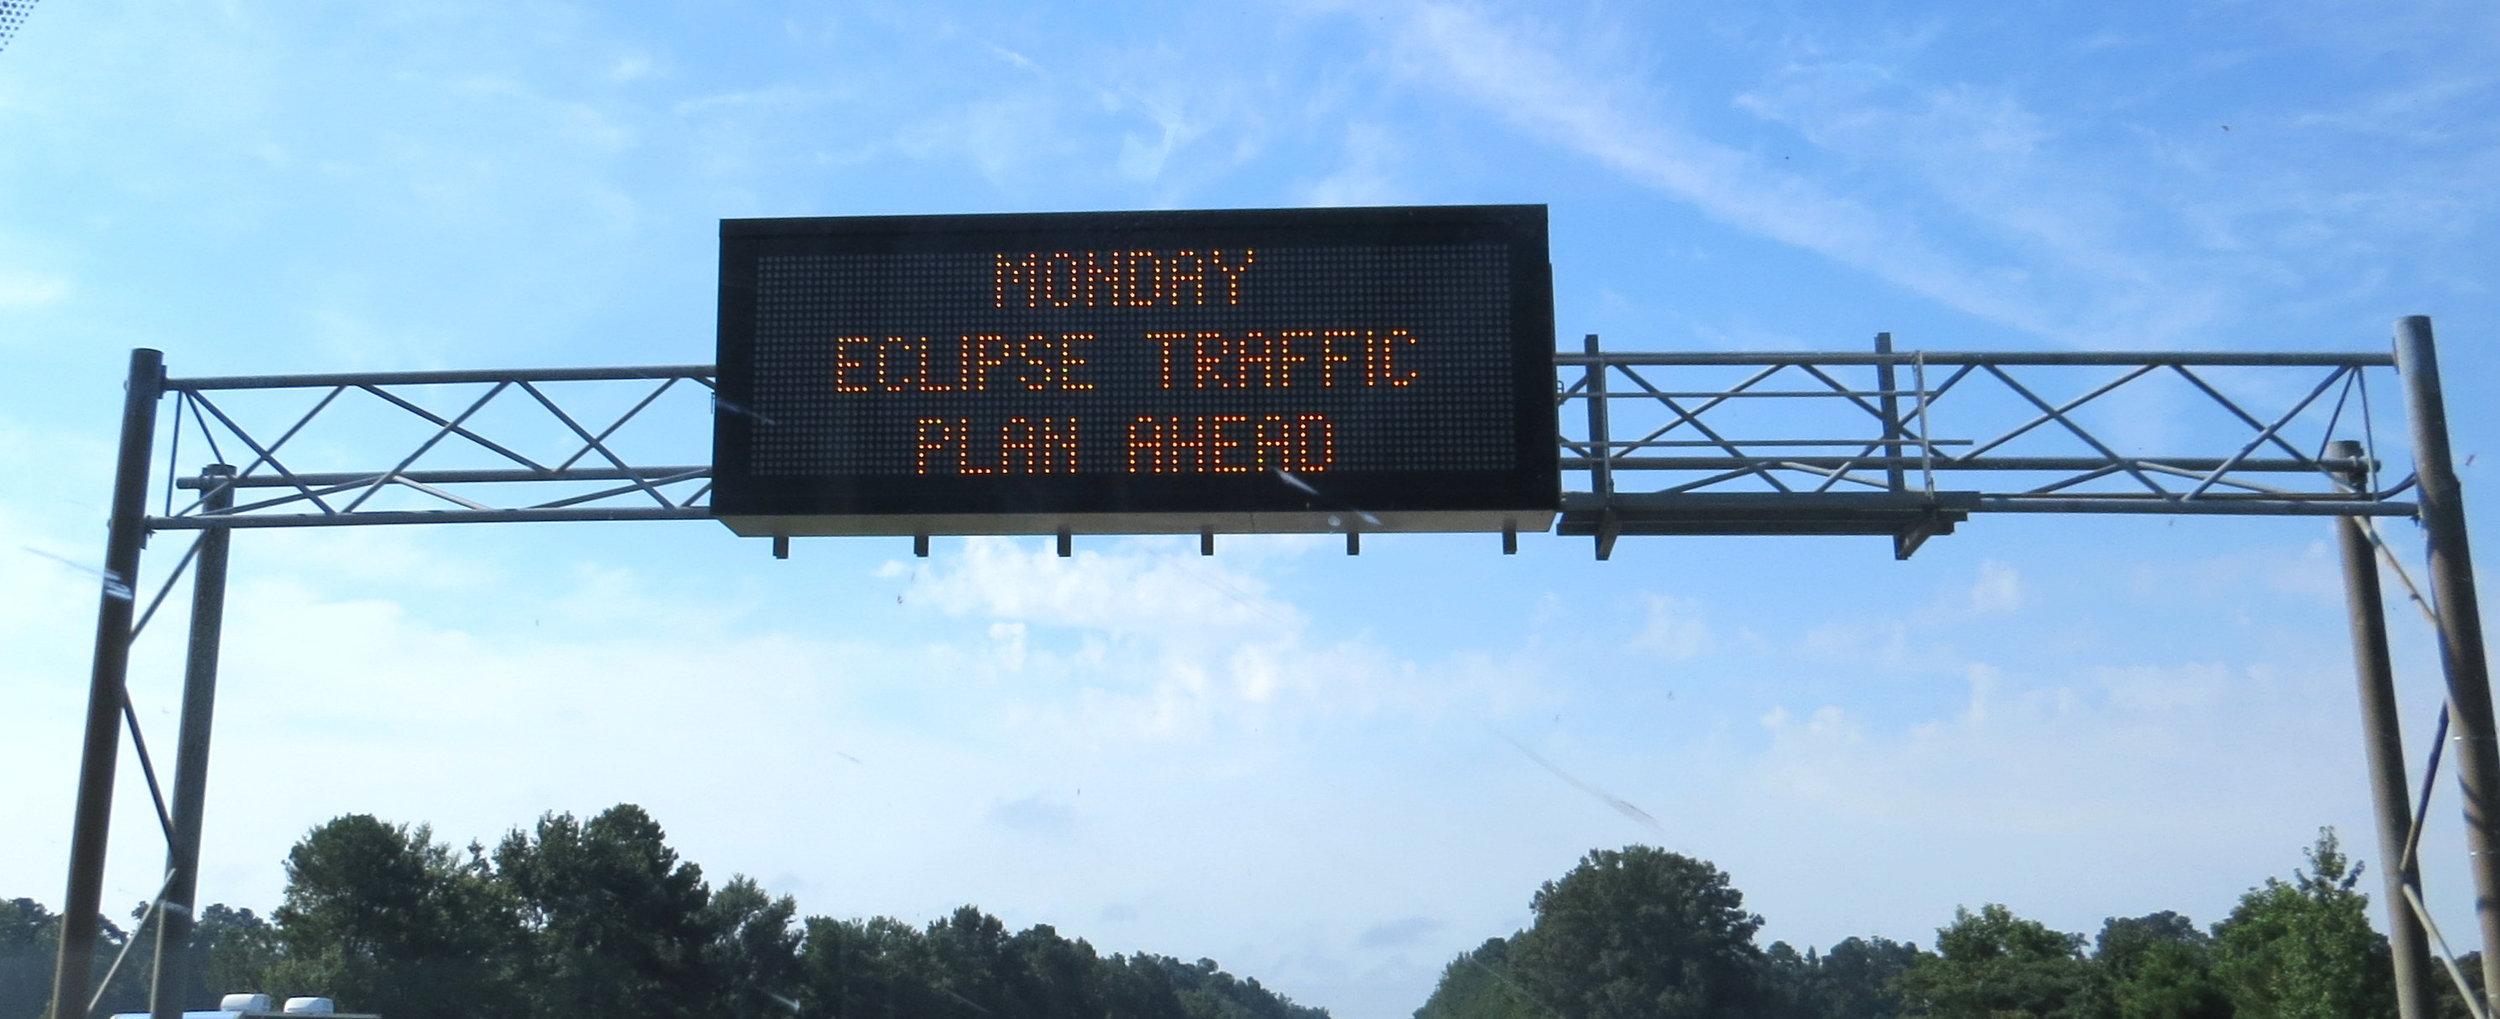 eclipse_traffic ahead.JPG